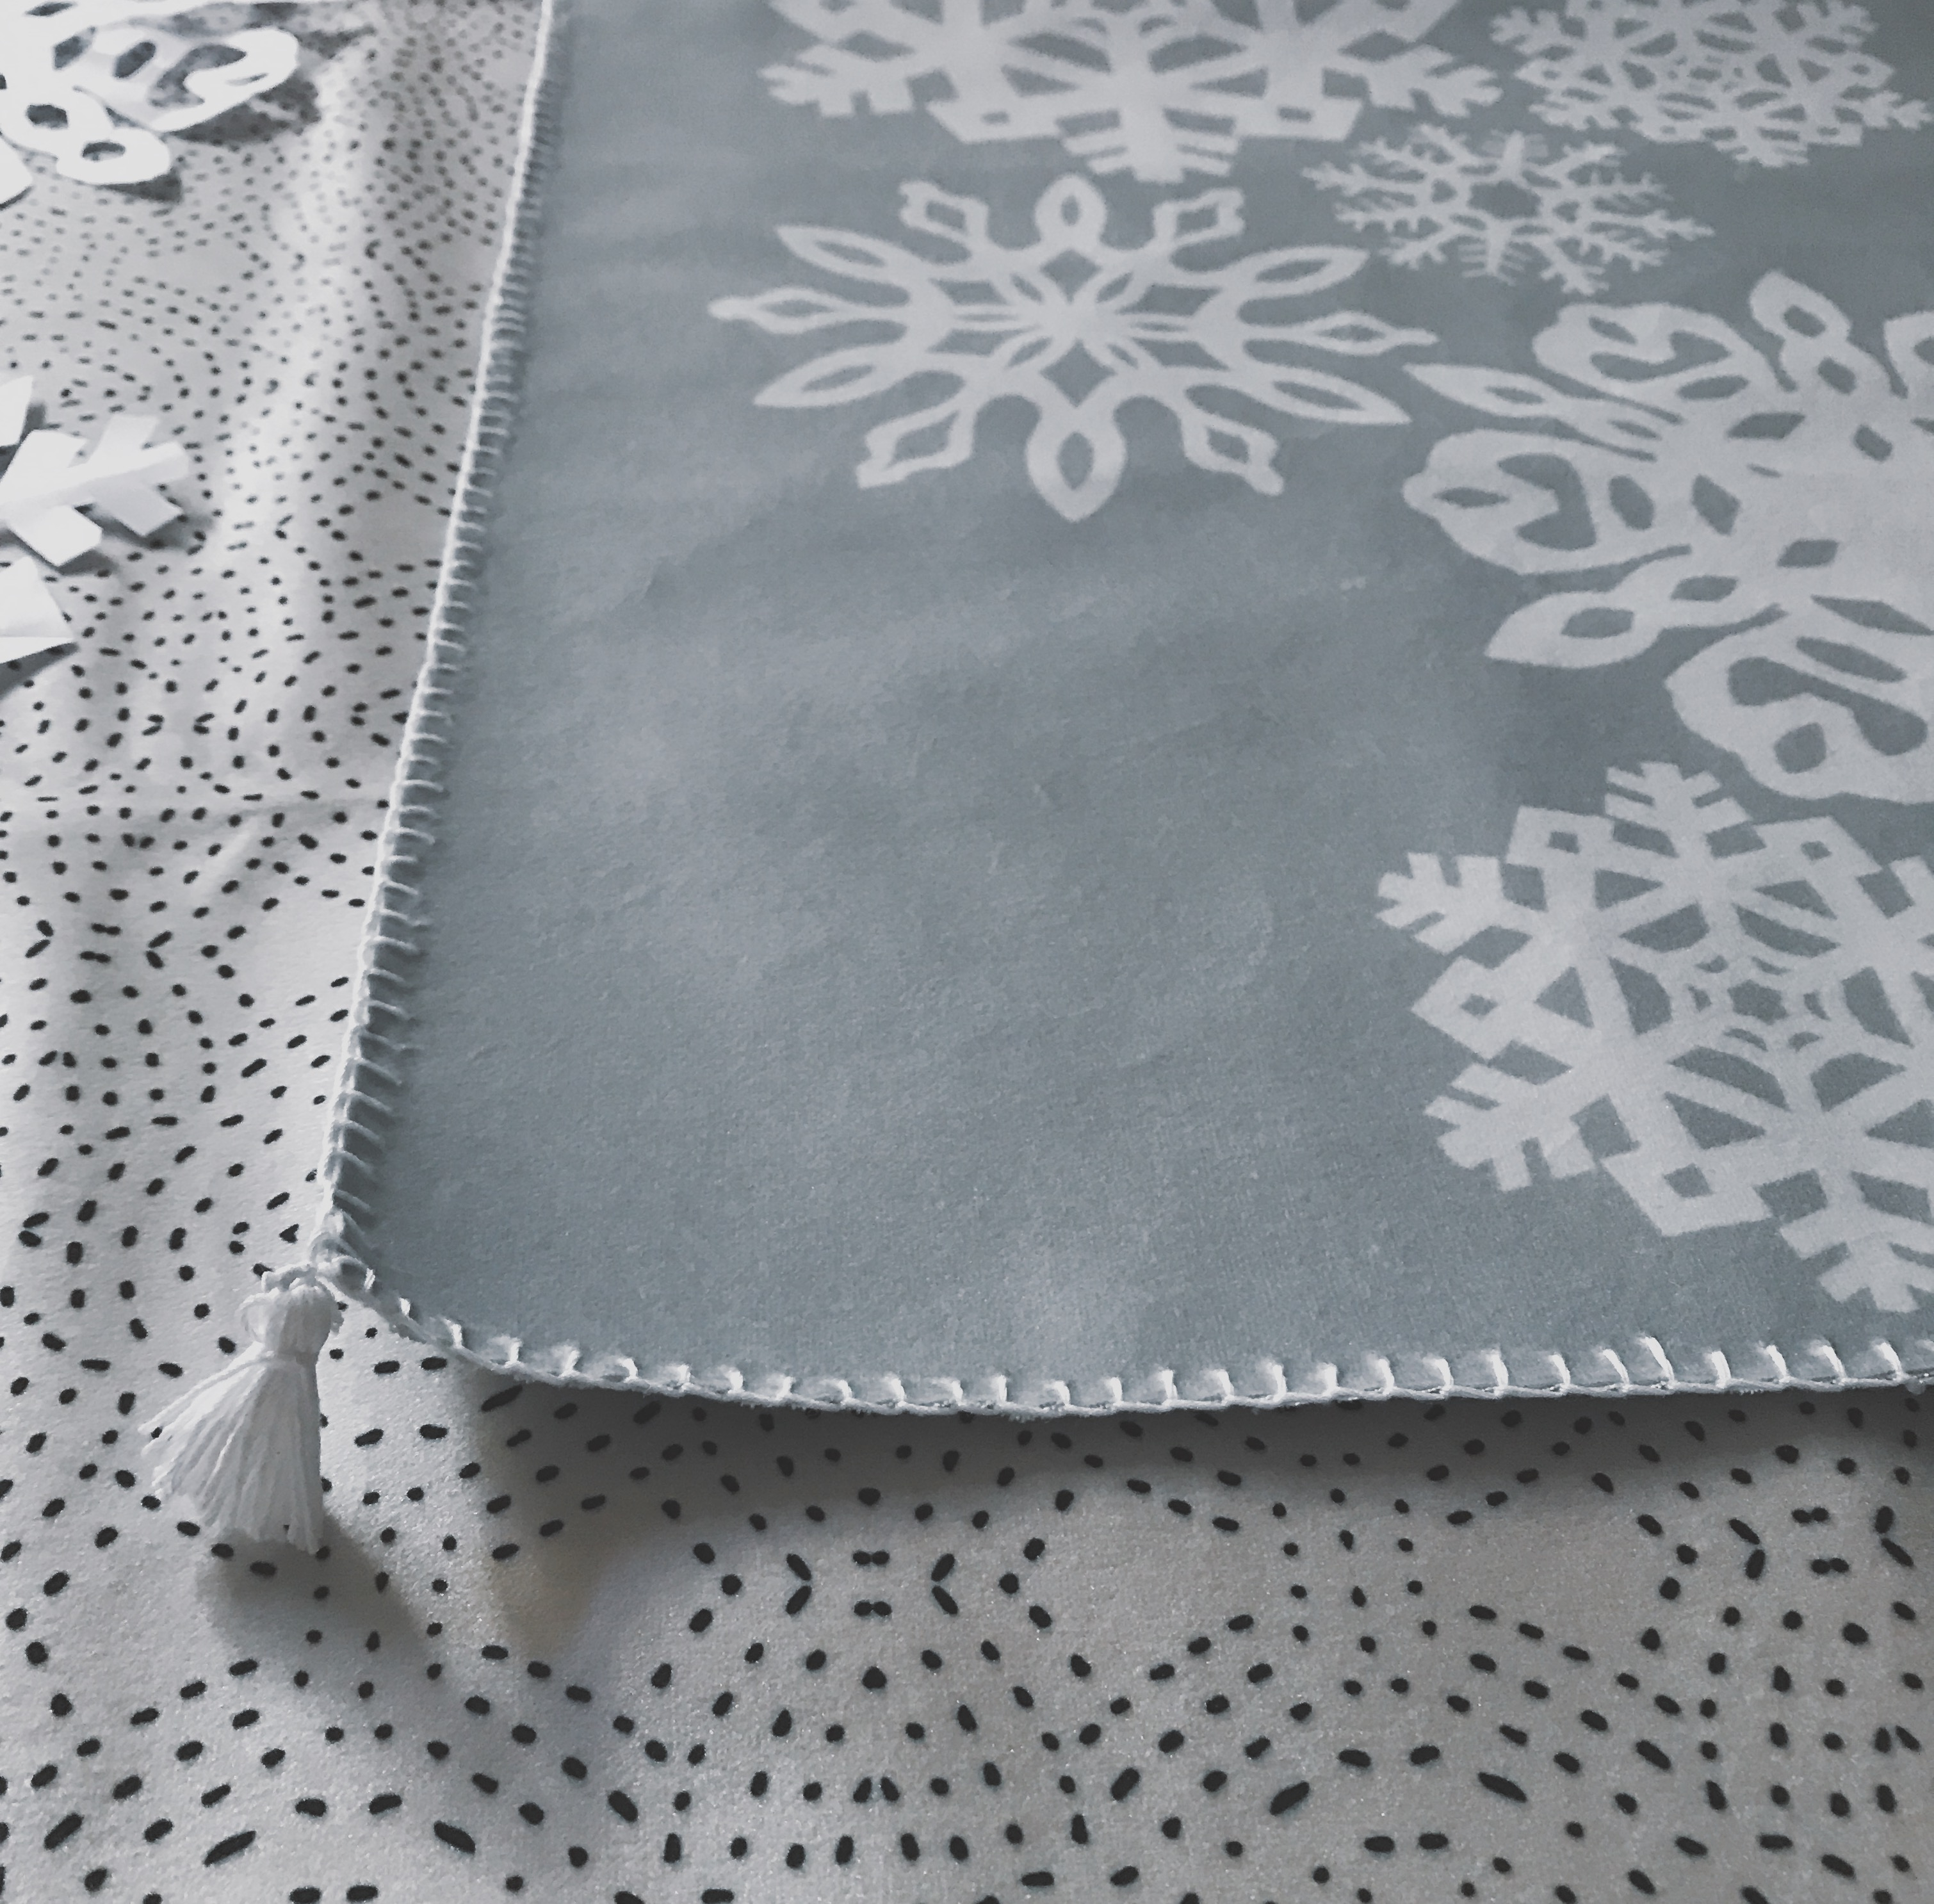 Making Spirits Bright: DIY Paper Snowflake Table Runner | Spoonflower Blog